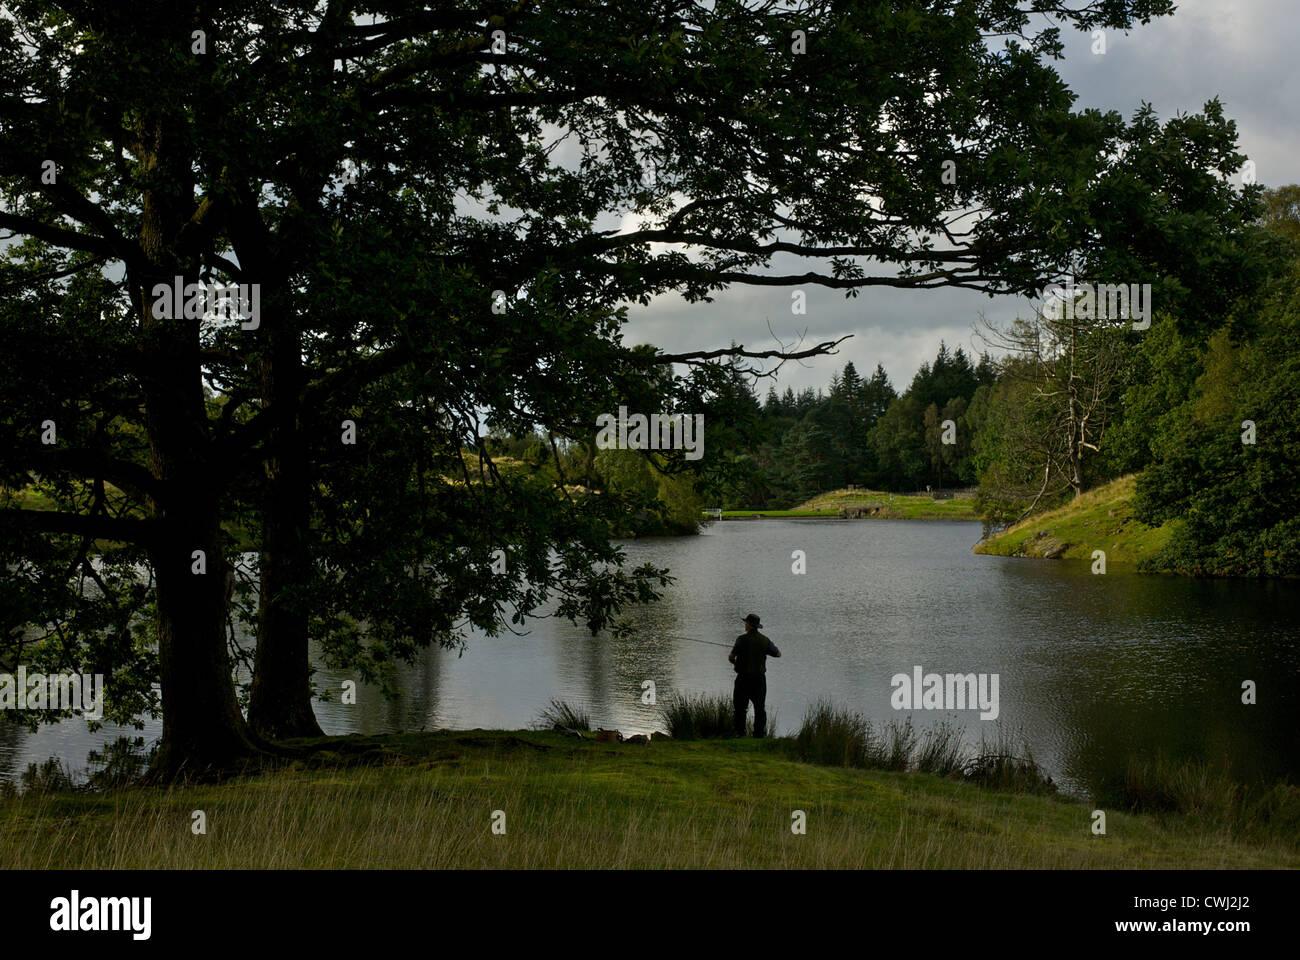 man-fishing-in-ghyll-head-reservoir-near-bowness-south-lakeland-lake-CWJ2J2.jpg